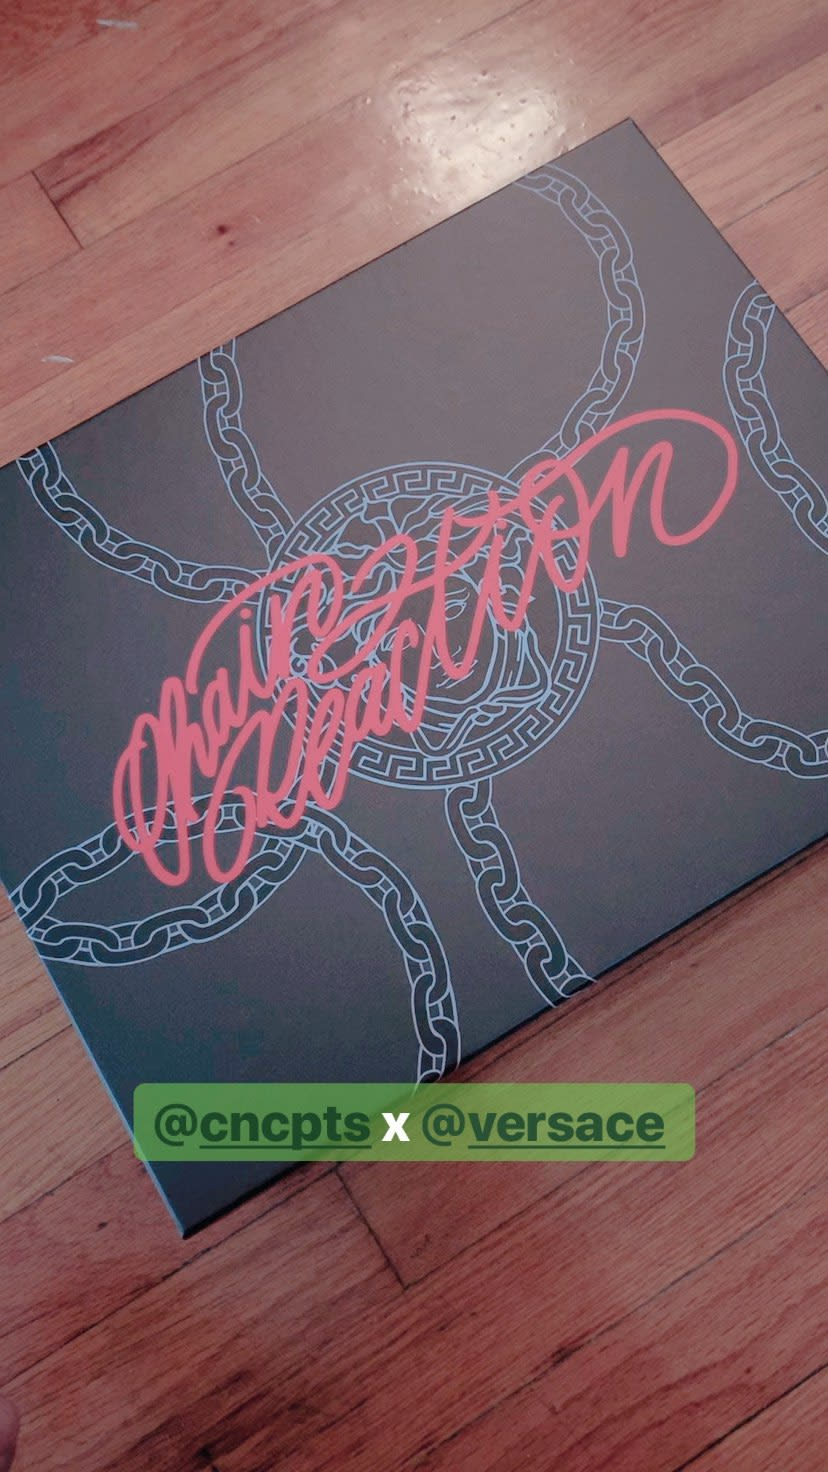 Concepts x Versace Chain Reaction (Box)